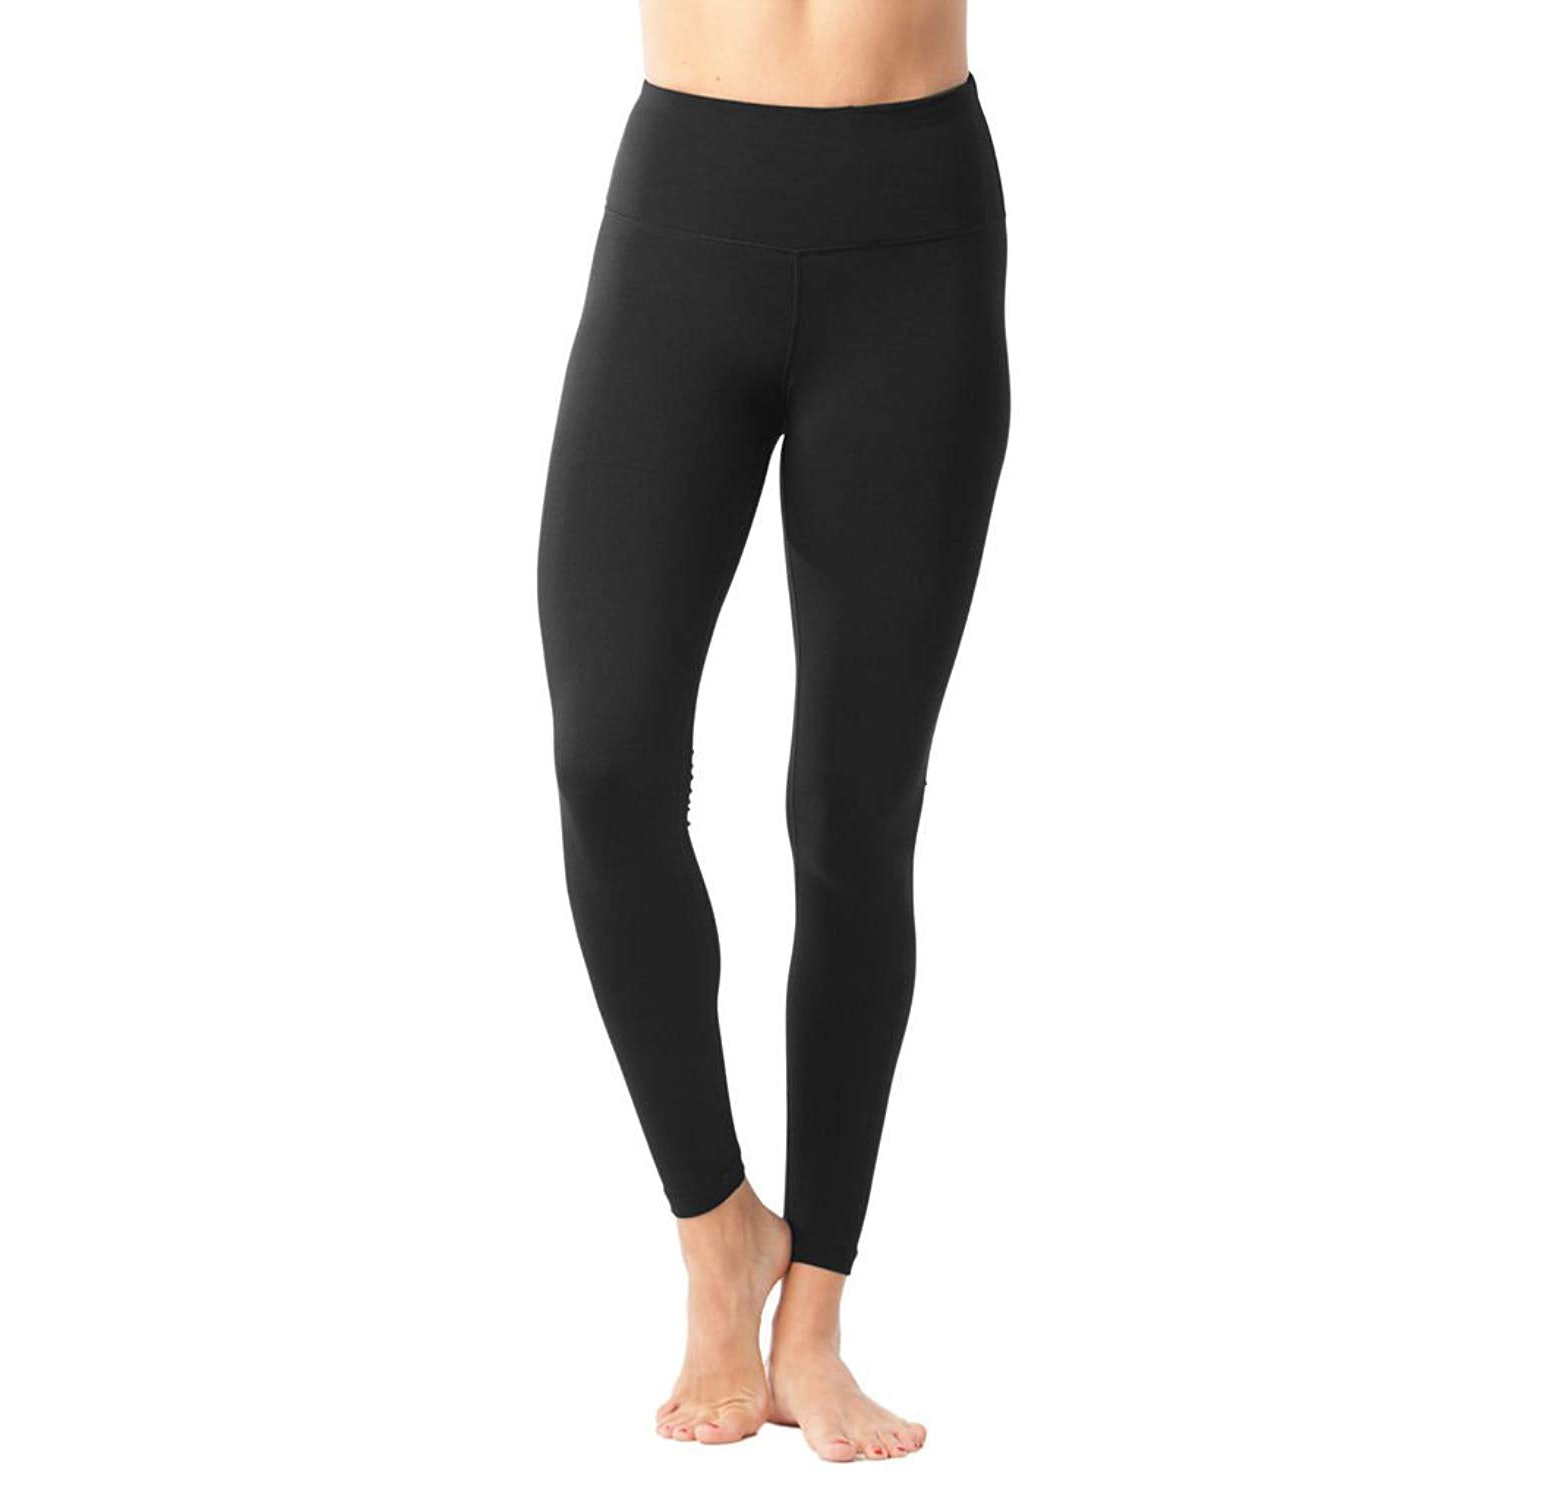 "36/"" Inseam Premium Women High Waist Soft Tummy Control Yoga leggings S-5X USA"